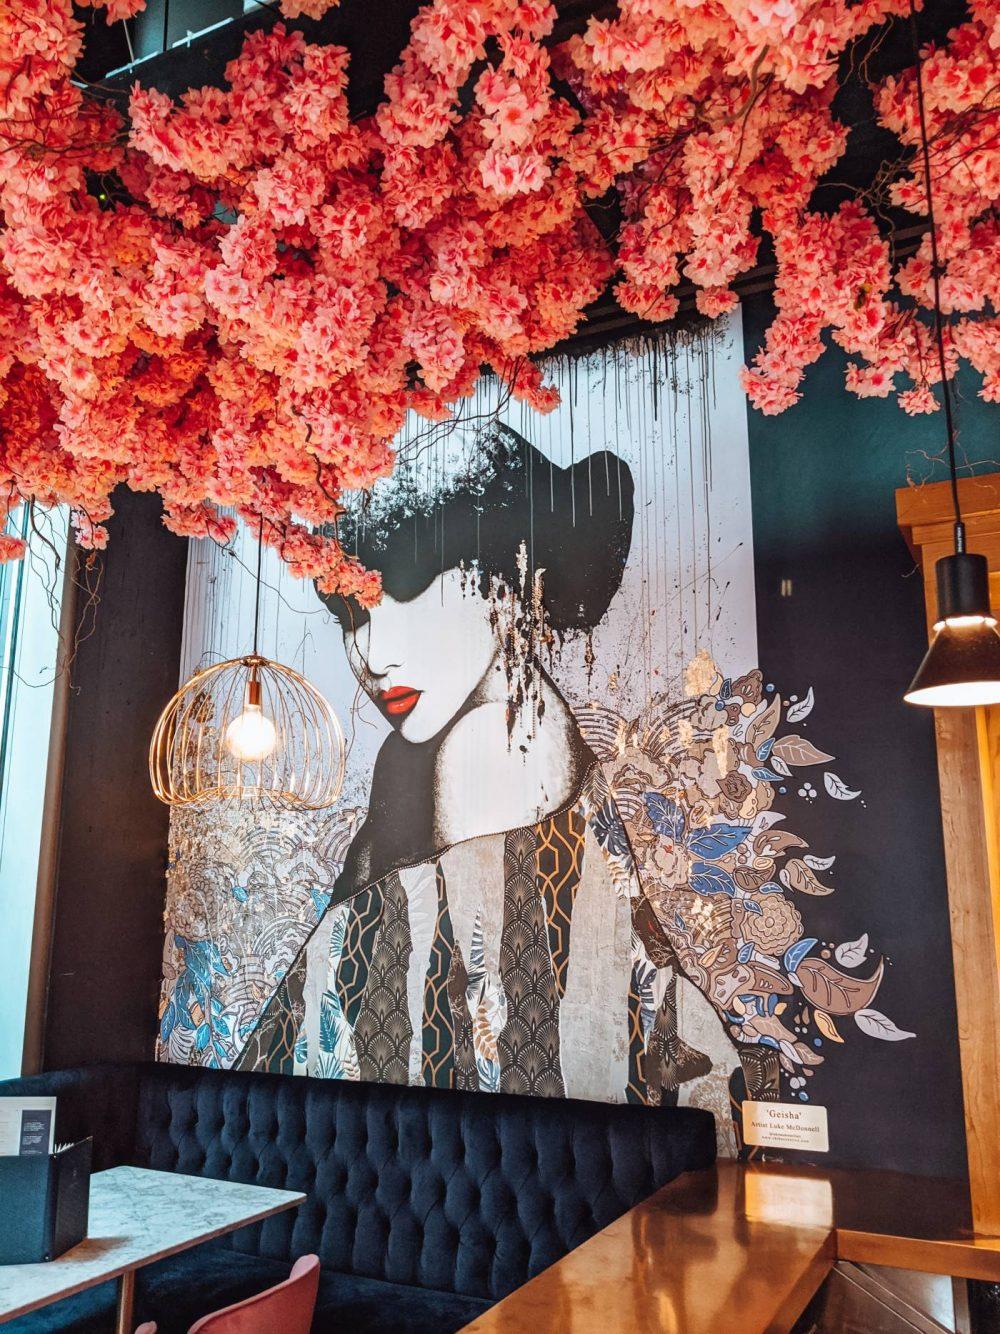 Geisha Painting by Luke McDonnell at the Blossom Room Milton Keynes